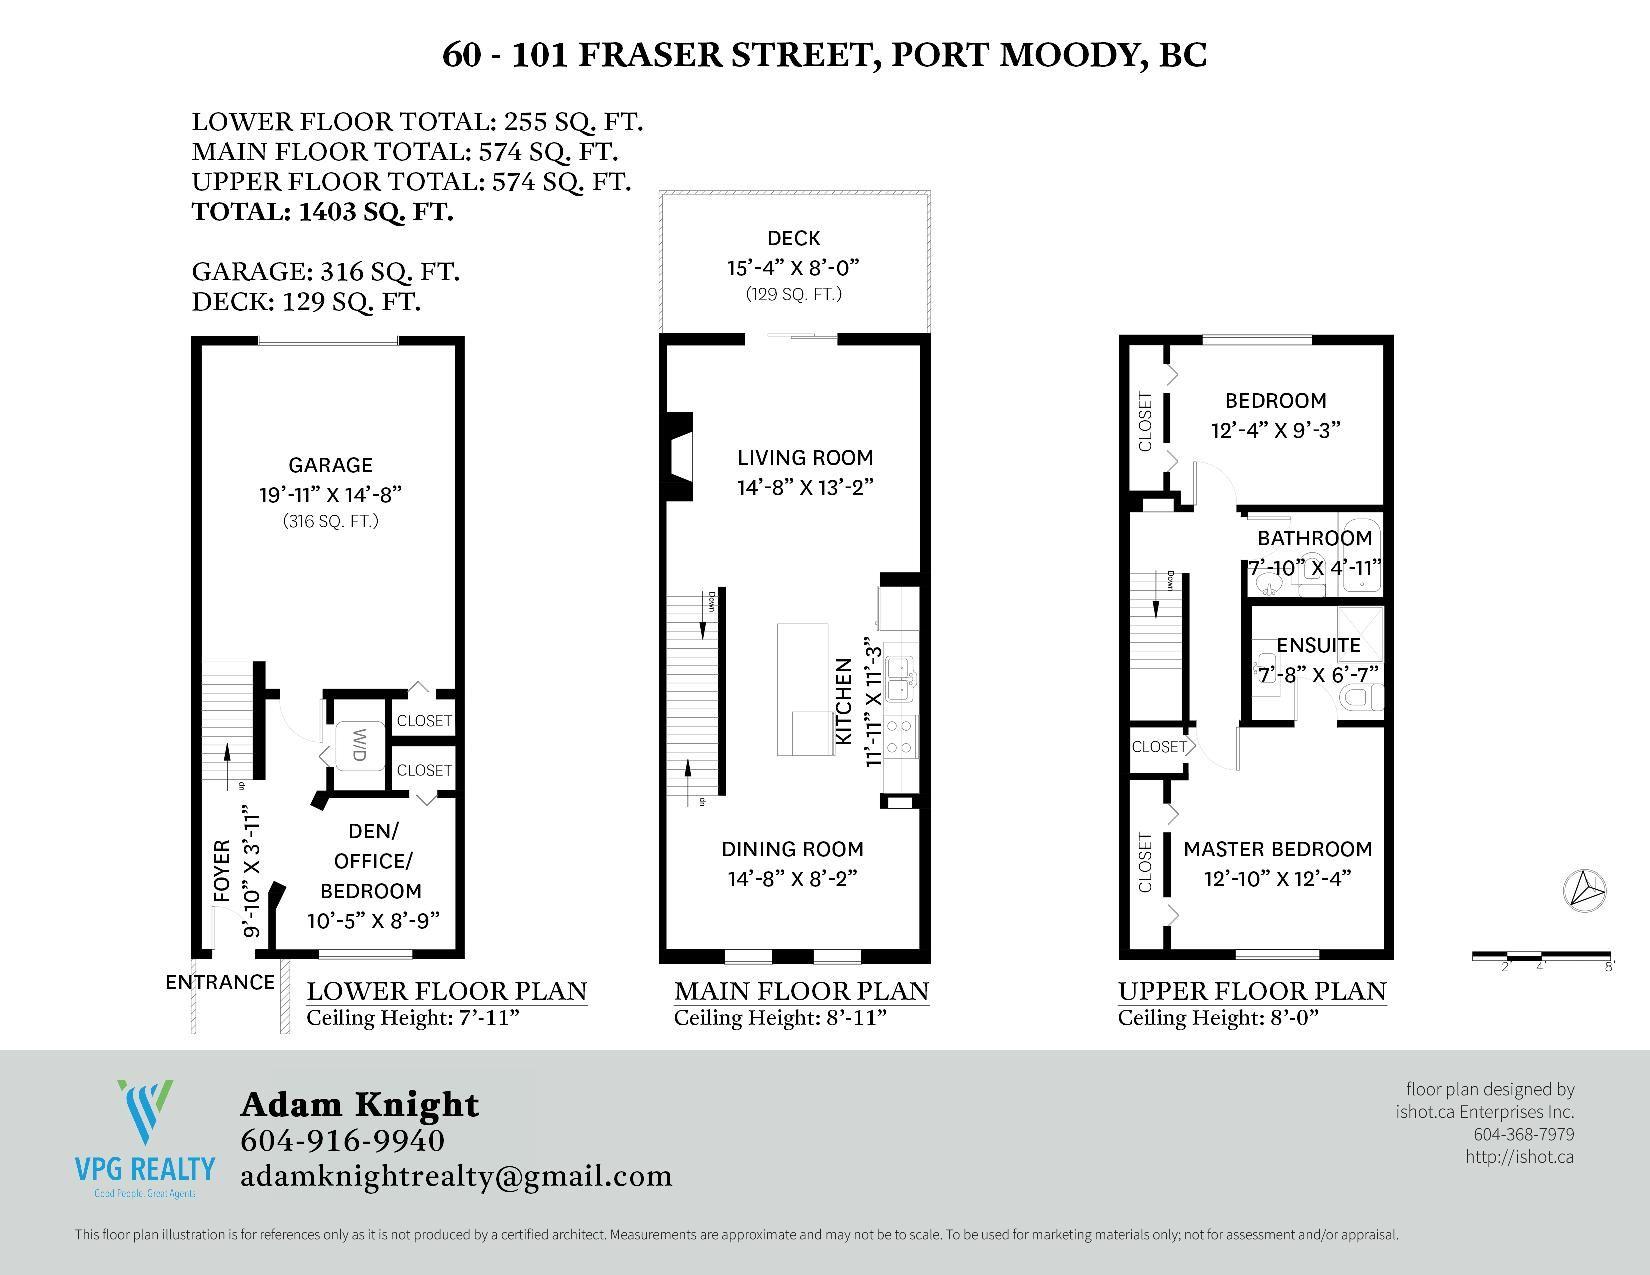 60 - 101 Fraser Street - Floorplan-page-001.jpg